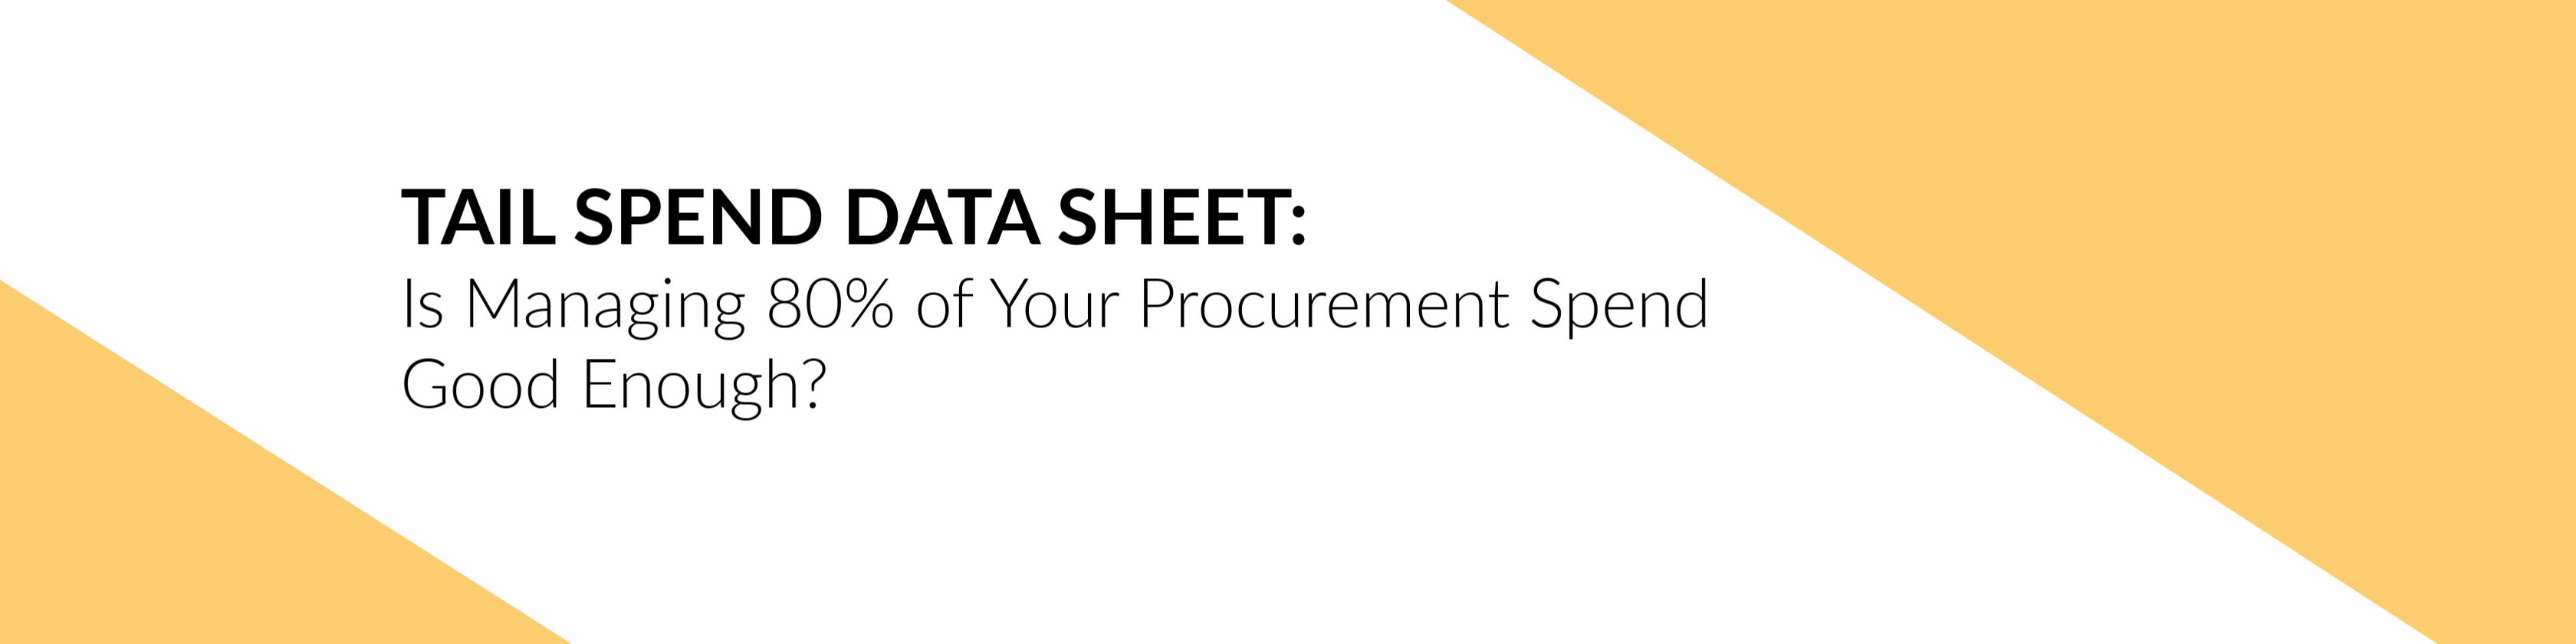 Tail Spend Data Sheet